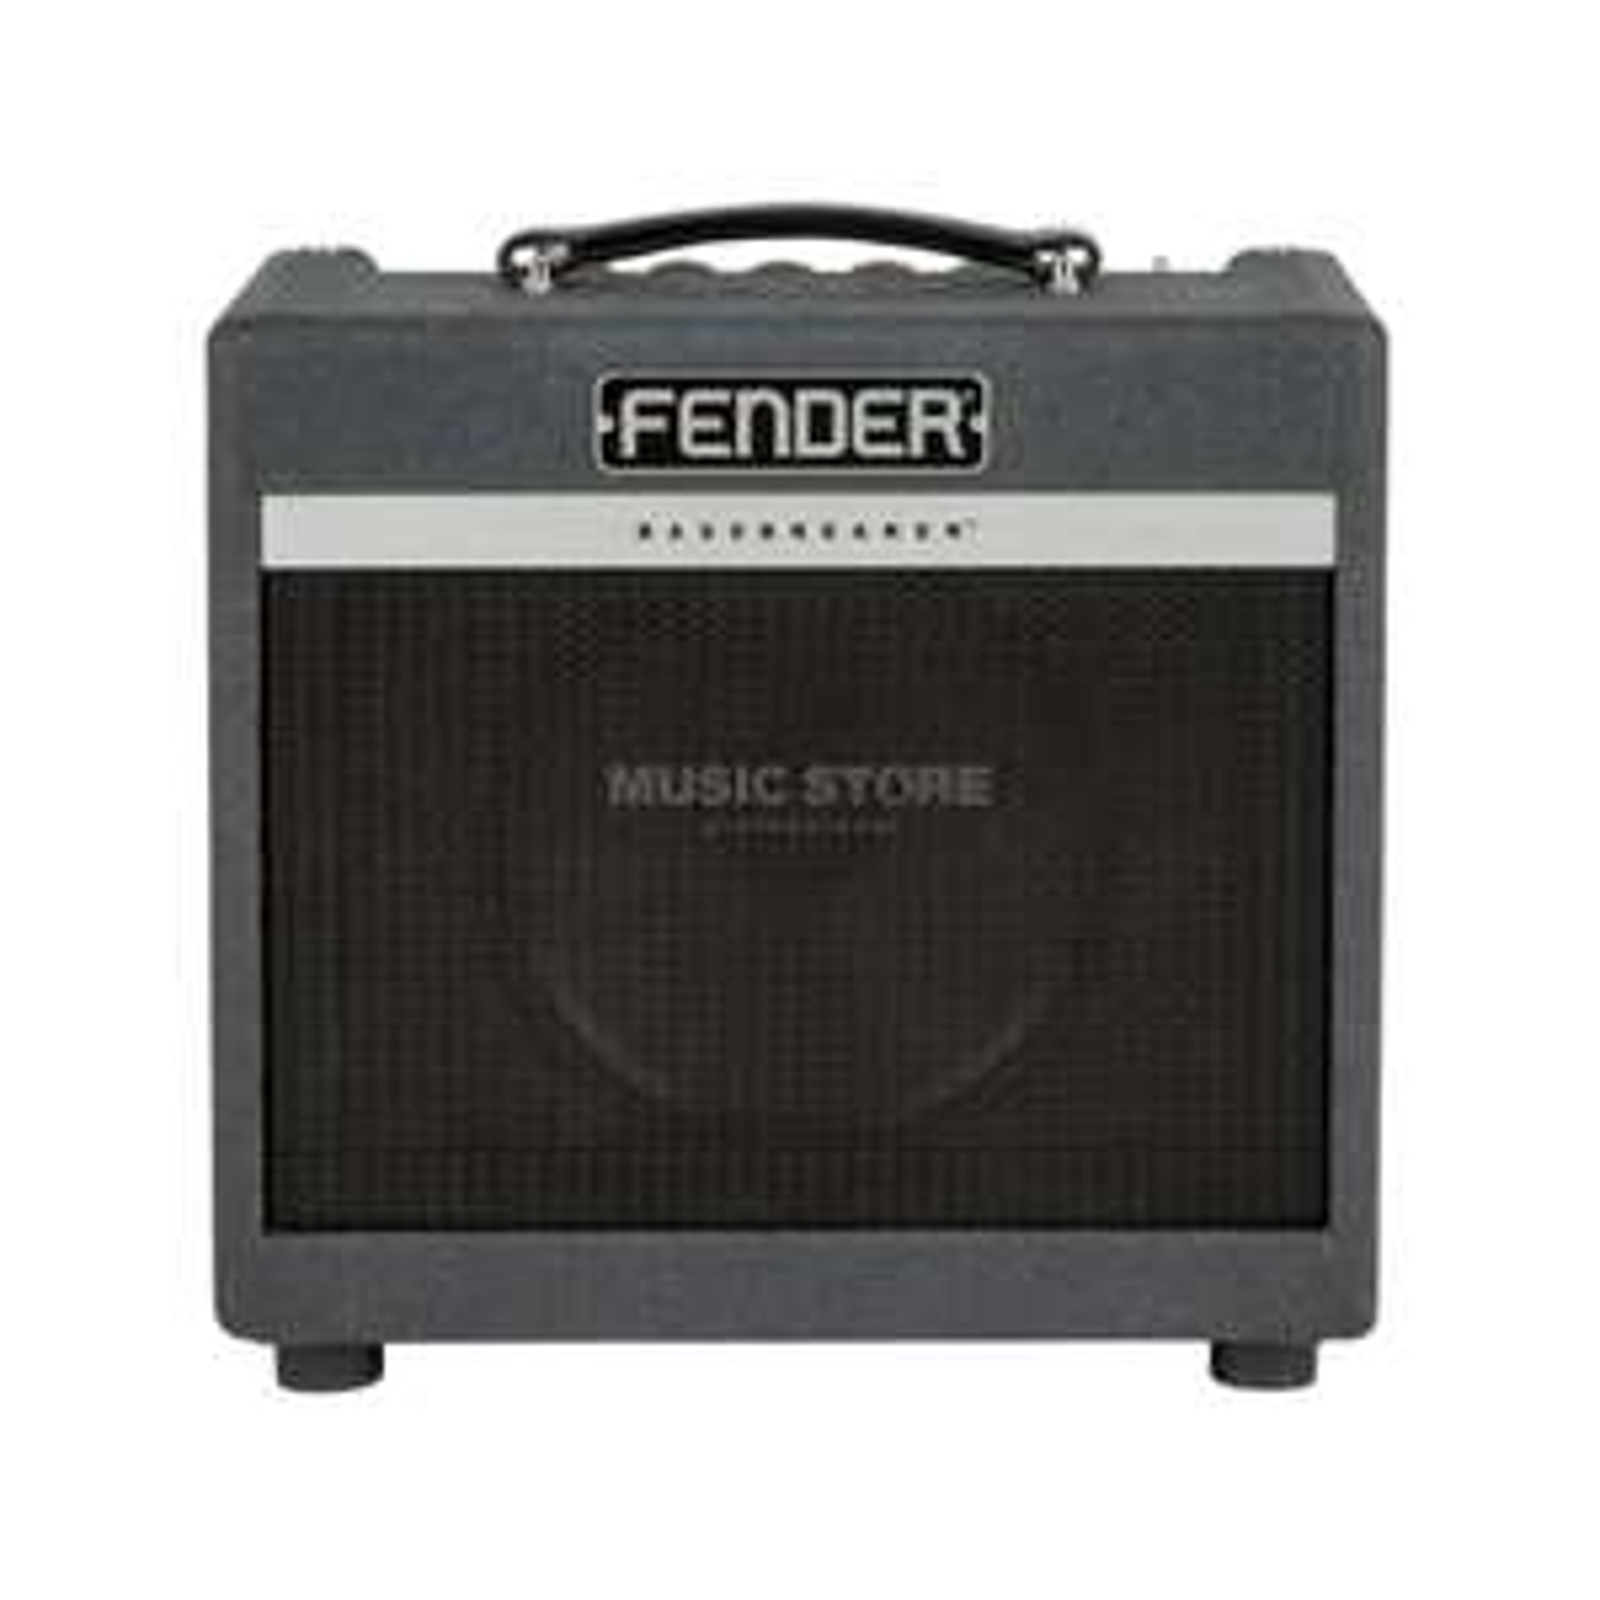 Ampli guitare à lampes Fender Bassbreaker 007